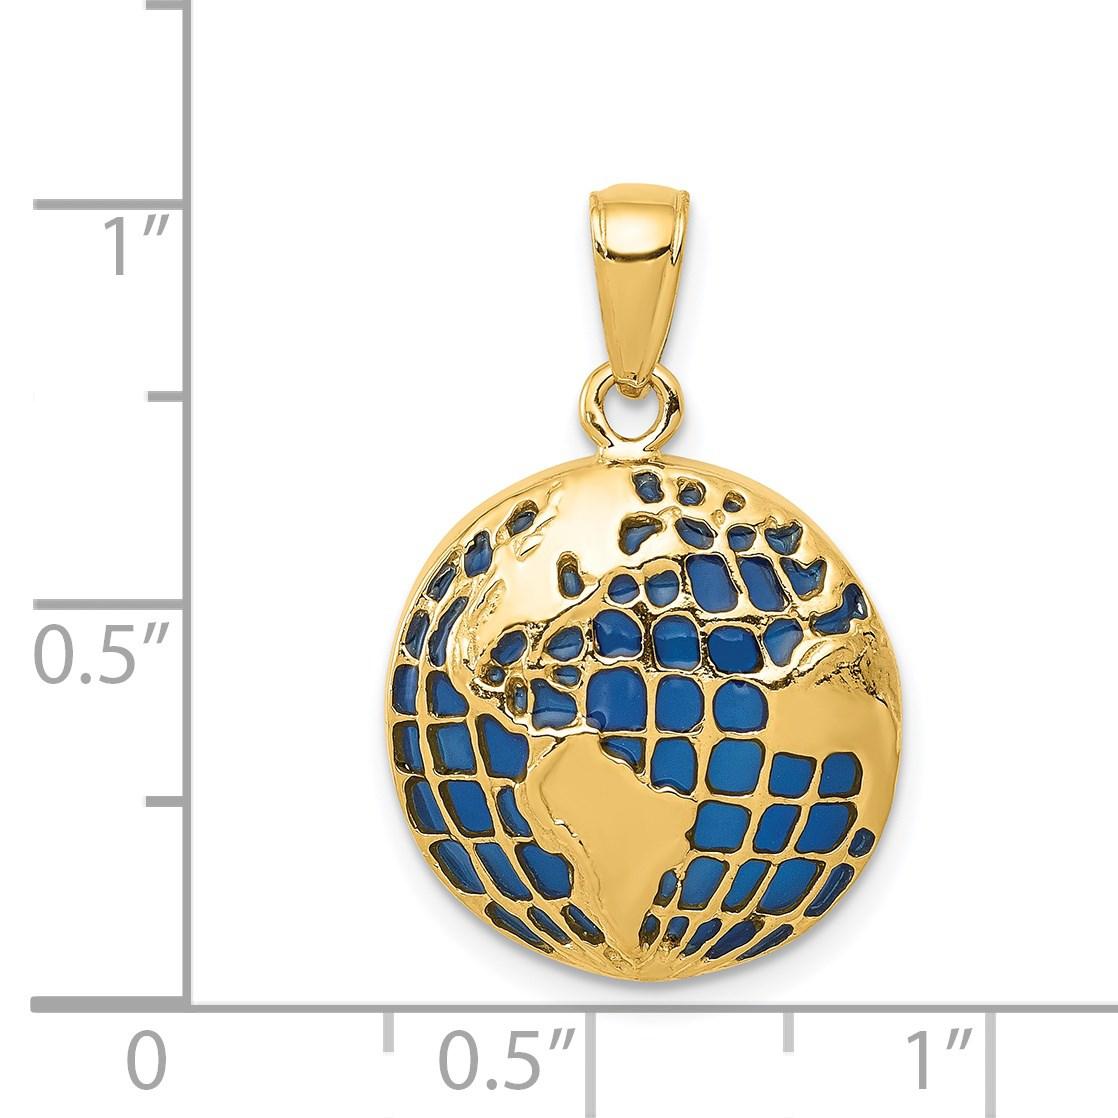 14k-Yellow-Gold-Blue-Translucent-Acrylic-Globe-Pendant-0-9INx0-6IN